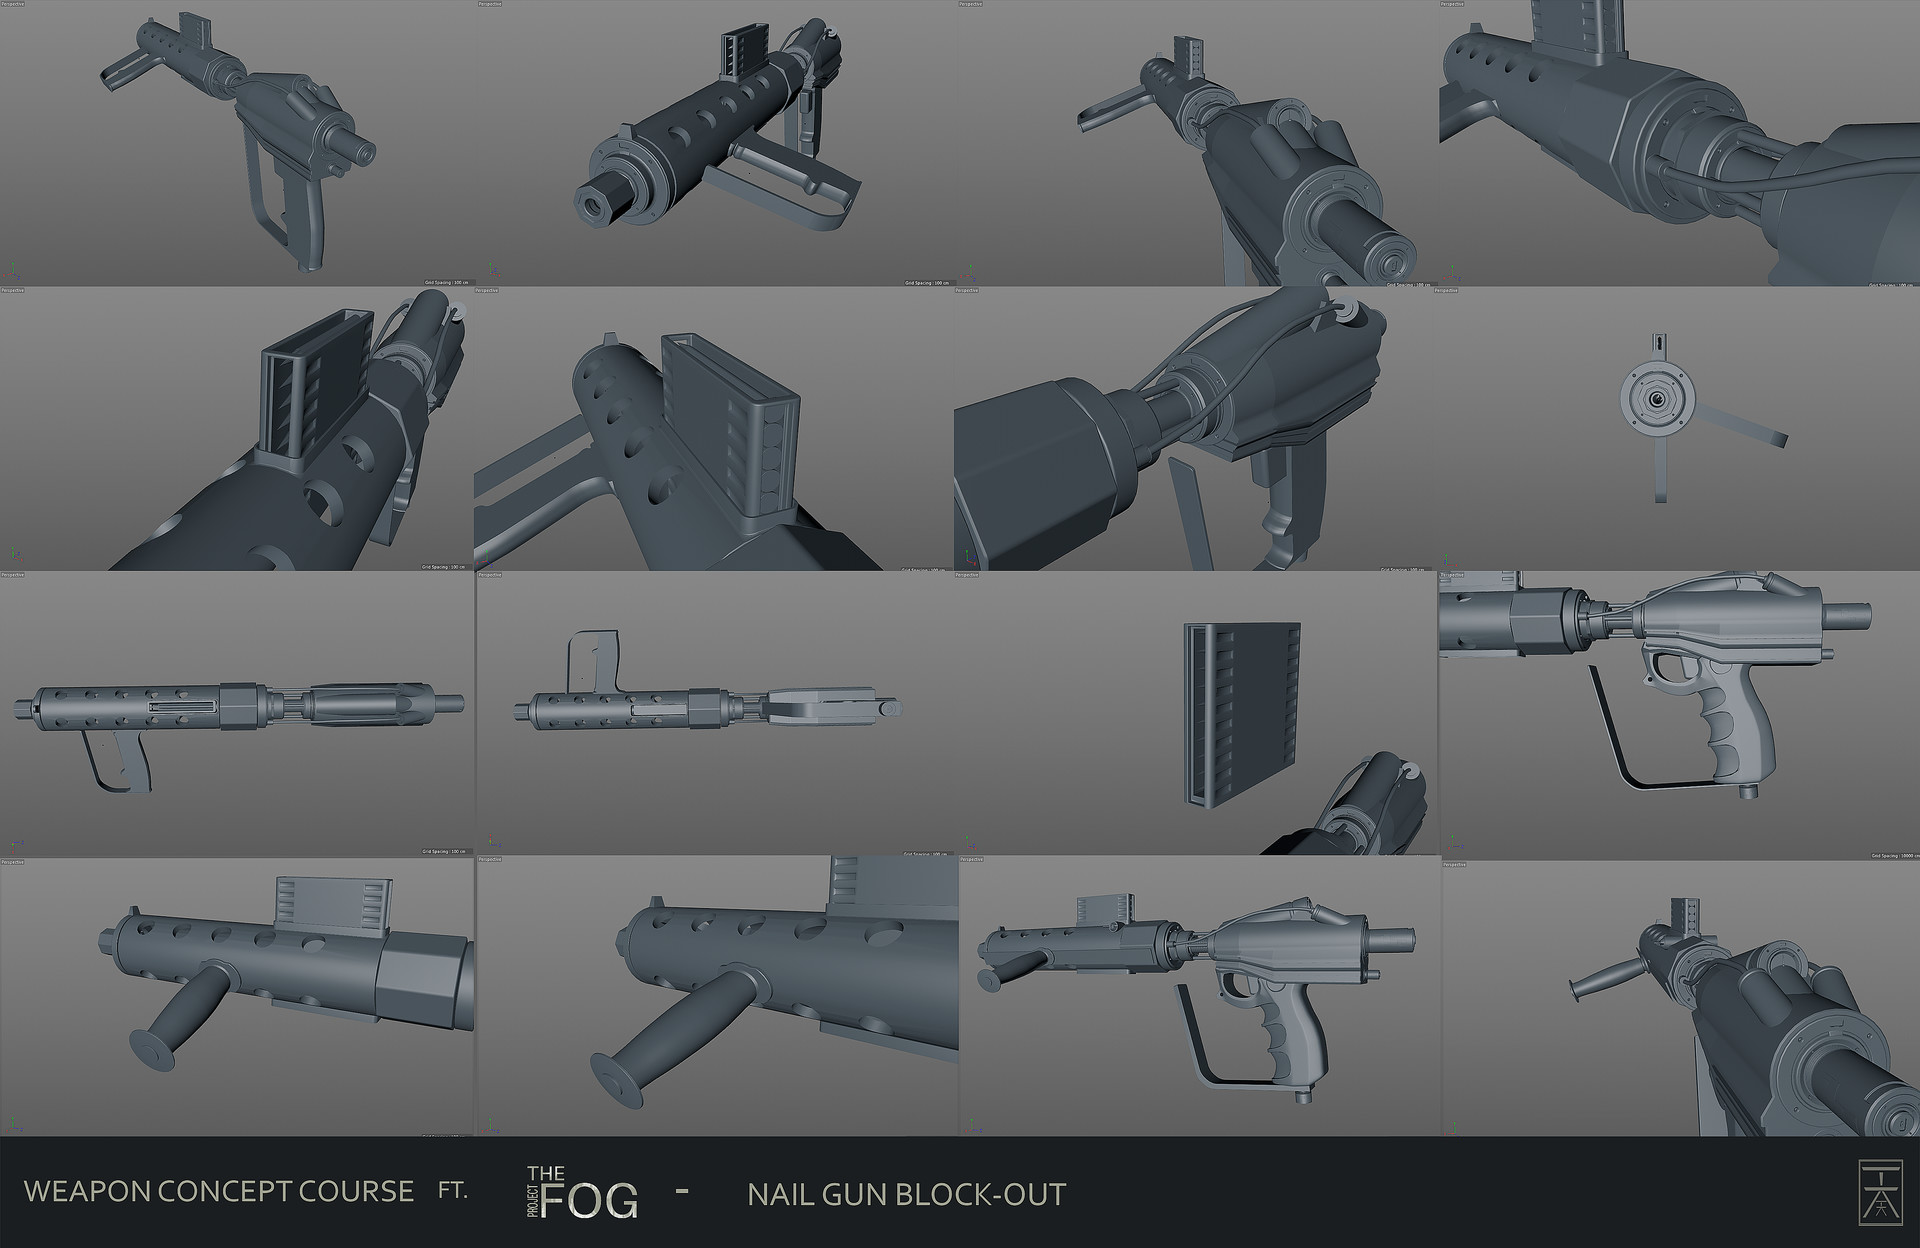 Hermann kromer project fog nailgun concept art hermann kromer hk wca02 hw wk1 nail gun 3dblockout 01 prinsesfo Images